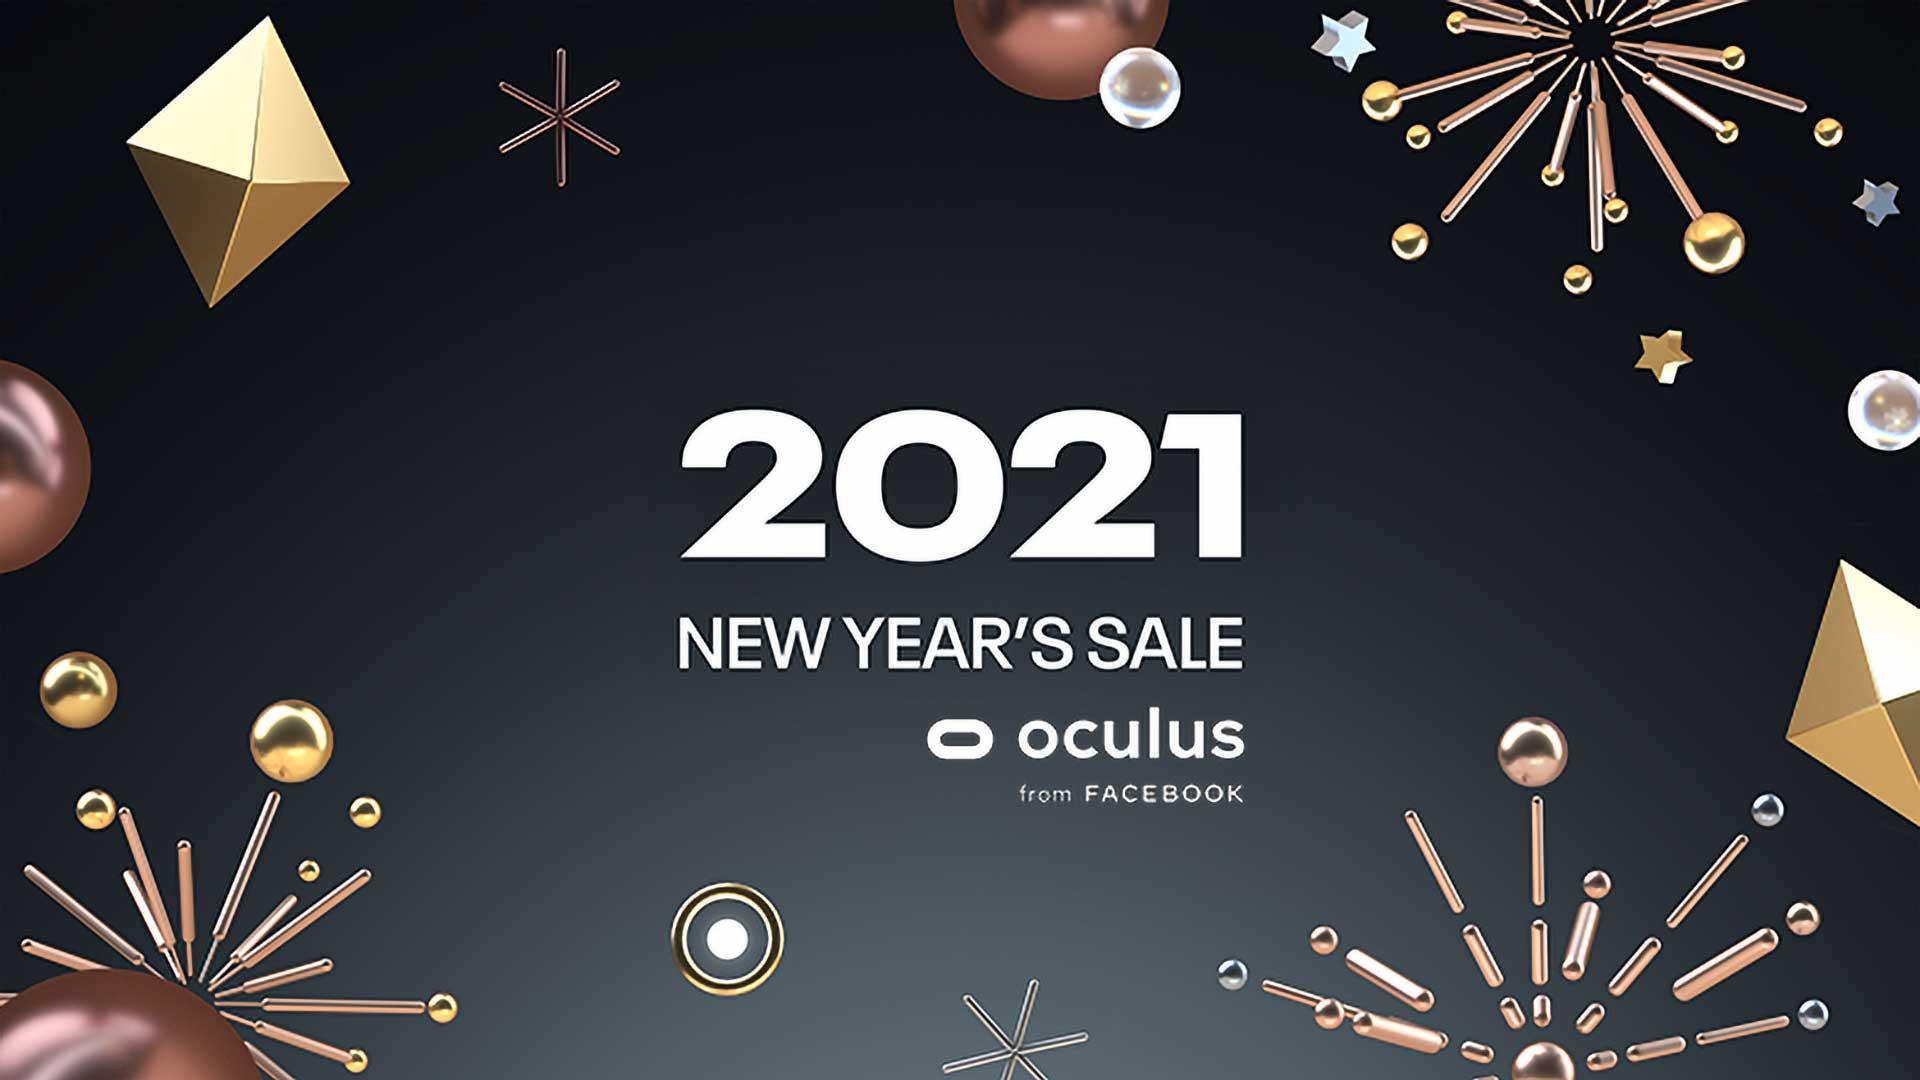 oculus 2021 new years sale